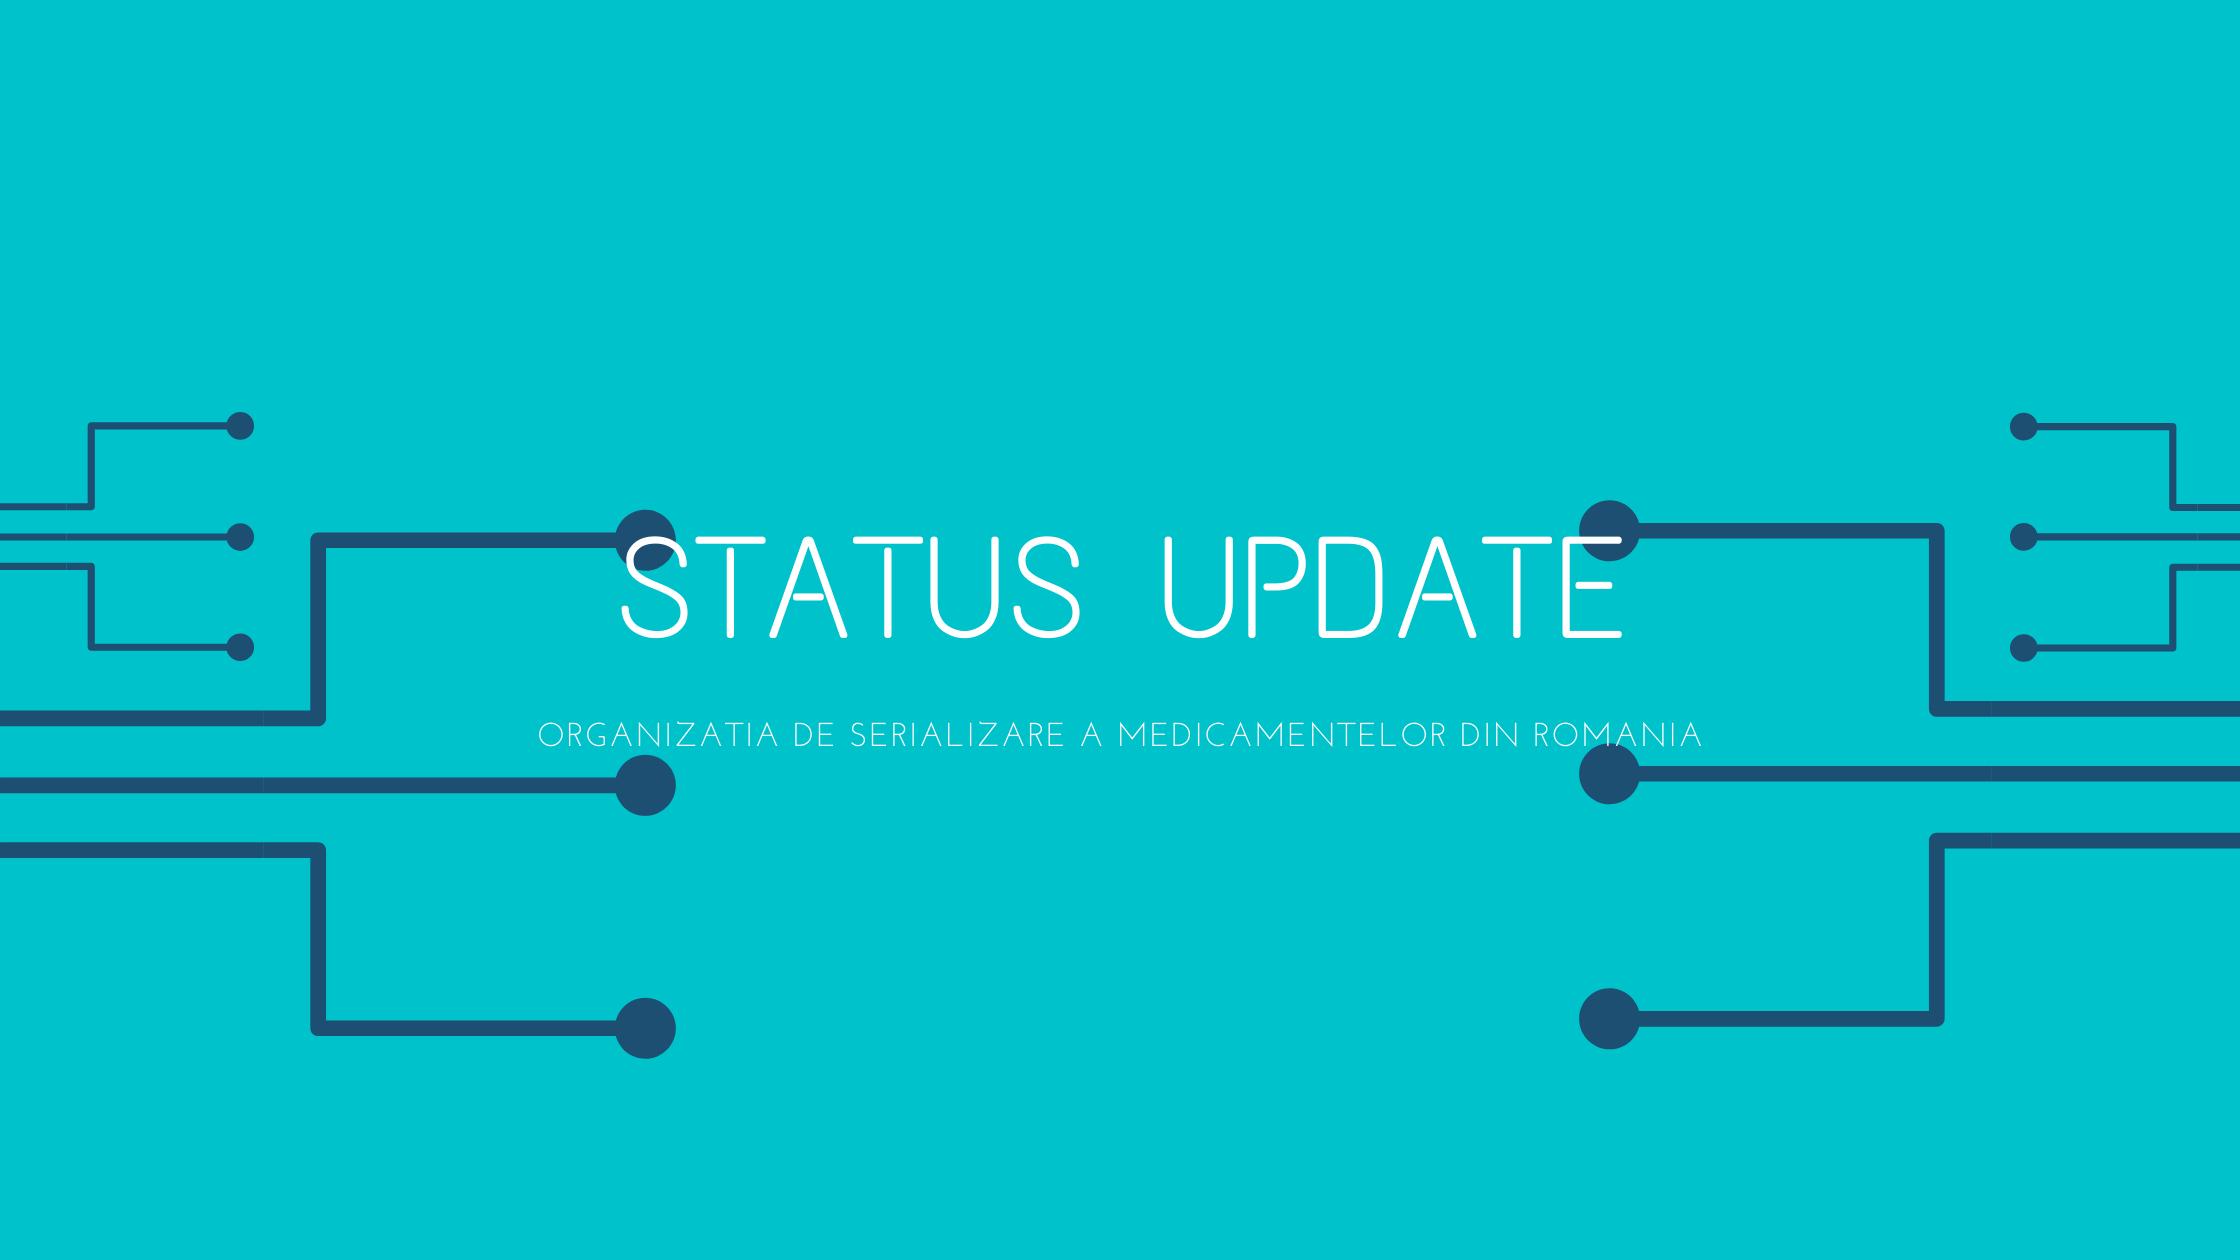 Raport OSMR - Status Update